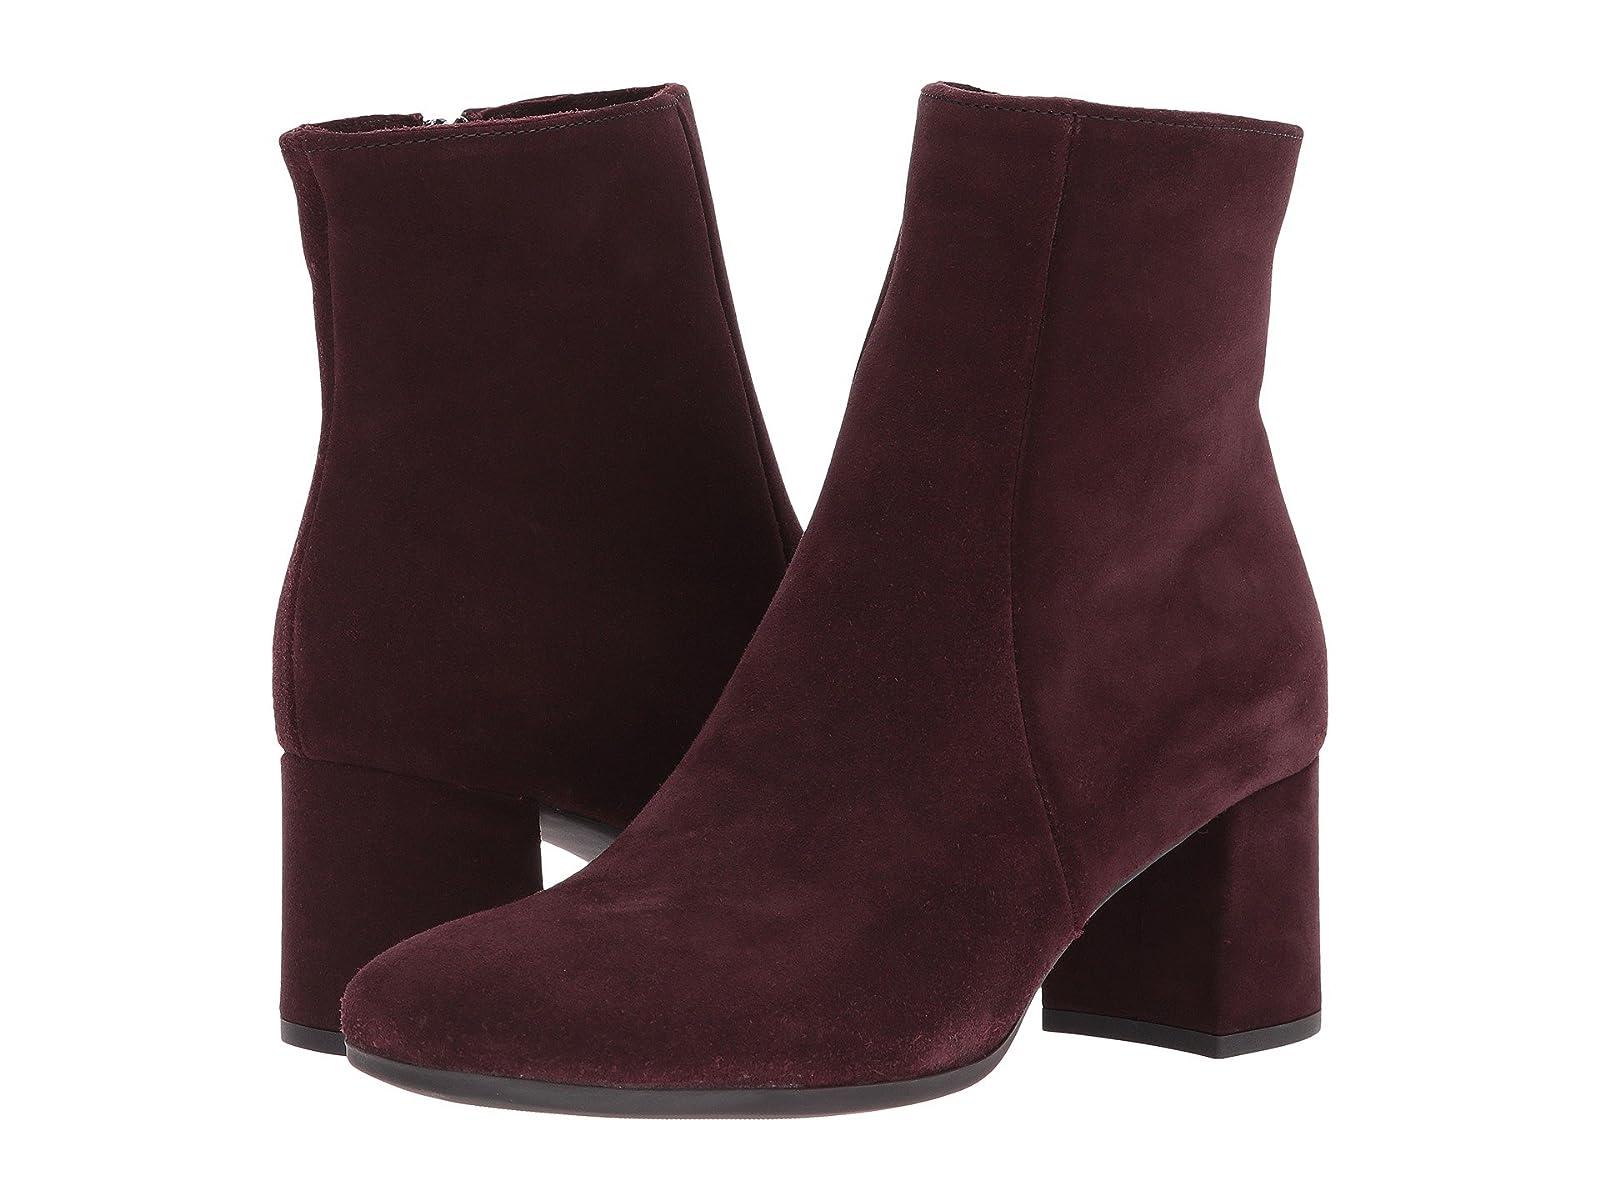 La Canadienne JojoAffordable and distinctive shoes